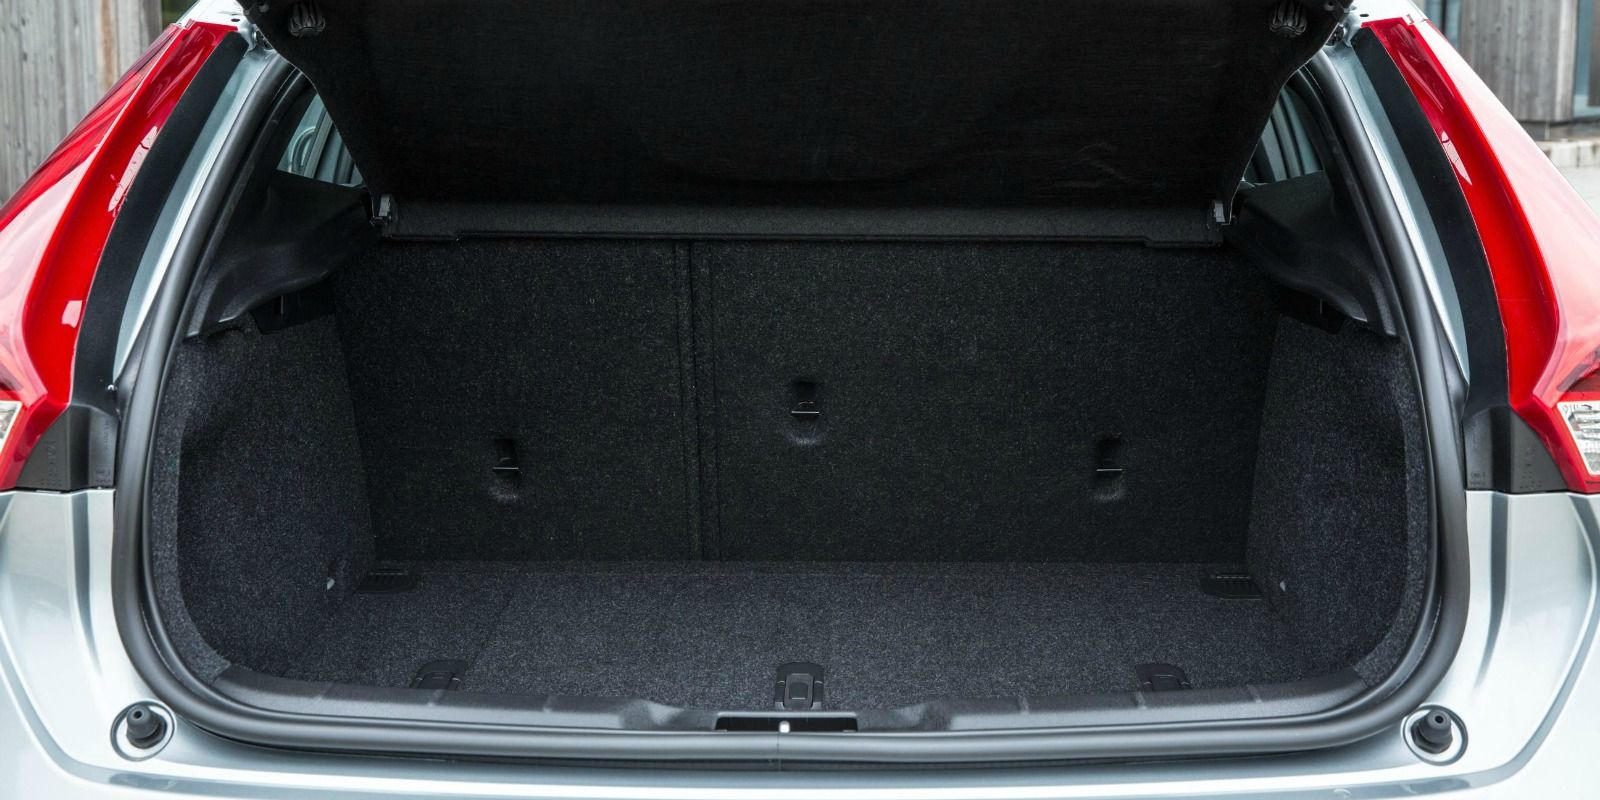 https://photos-1.carwow.co.uk/blog/1600/Volvo-V40-165.jpg